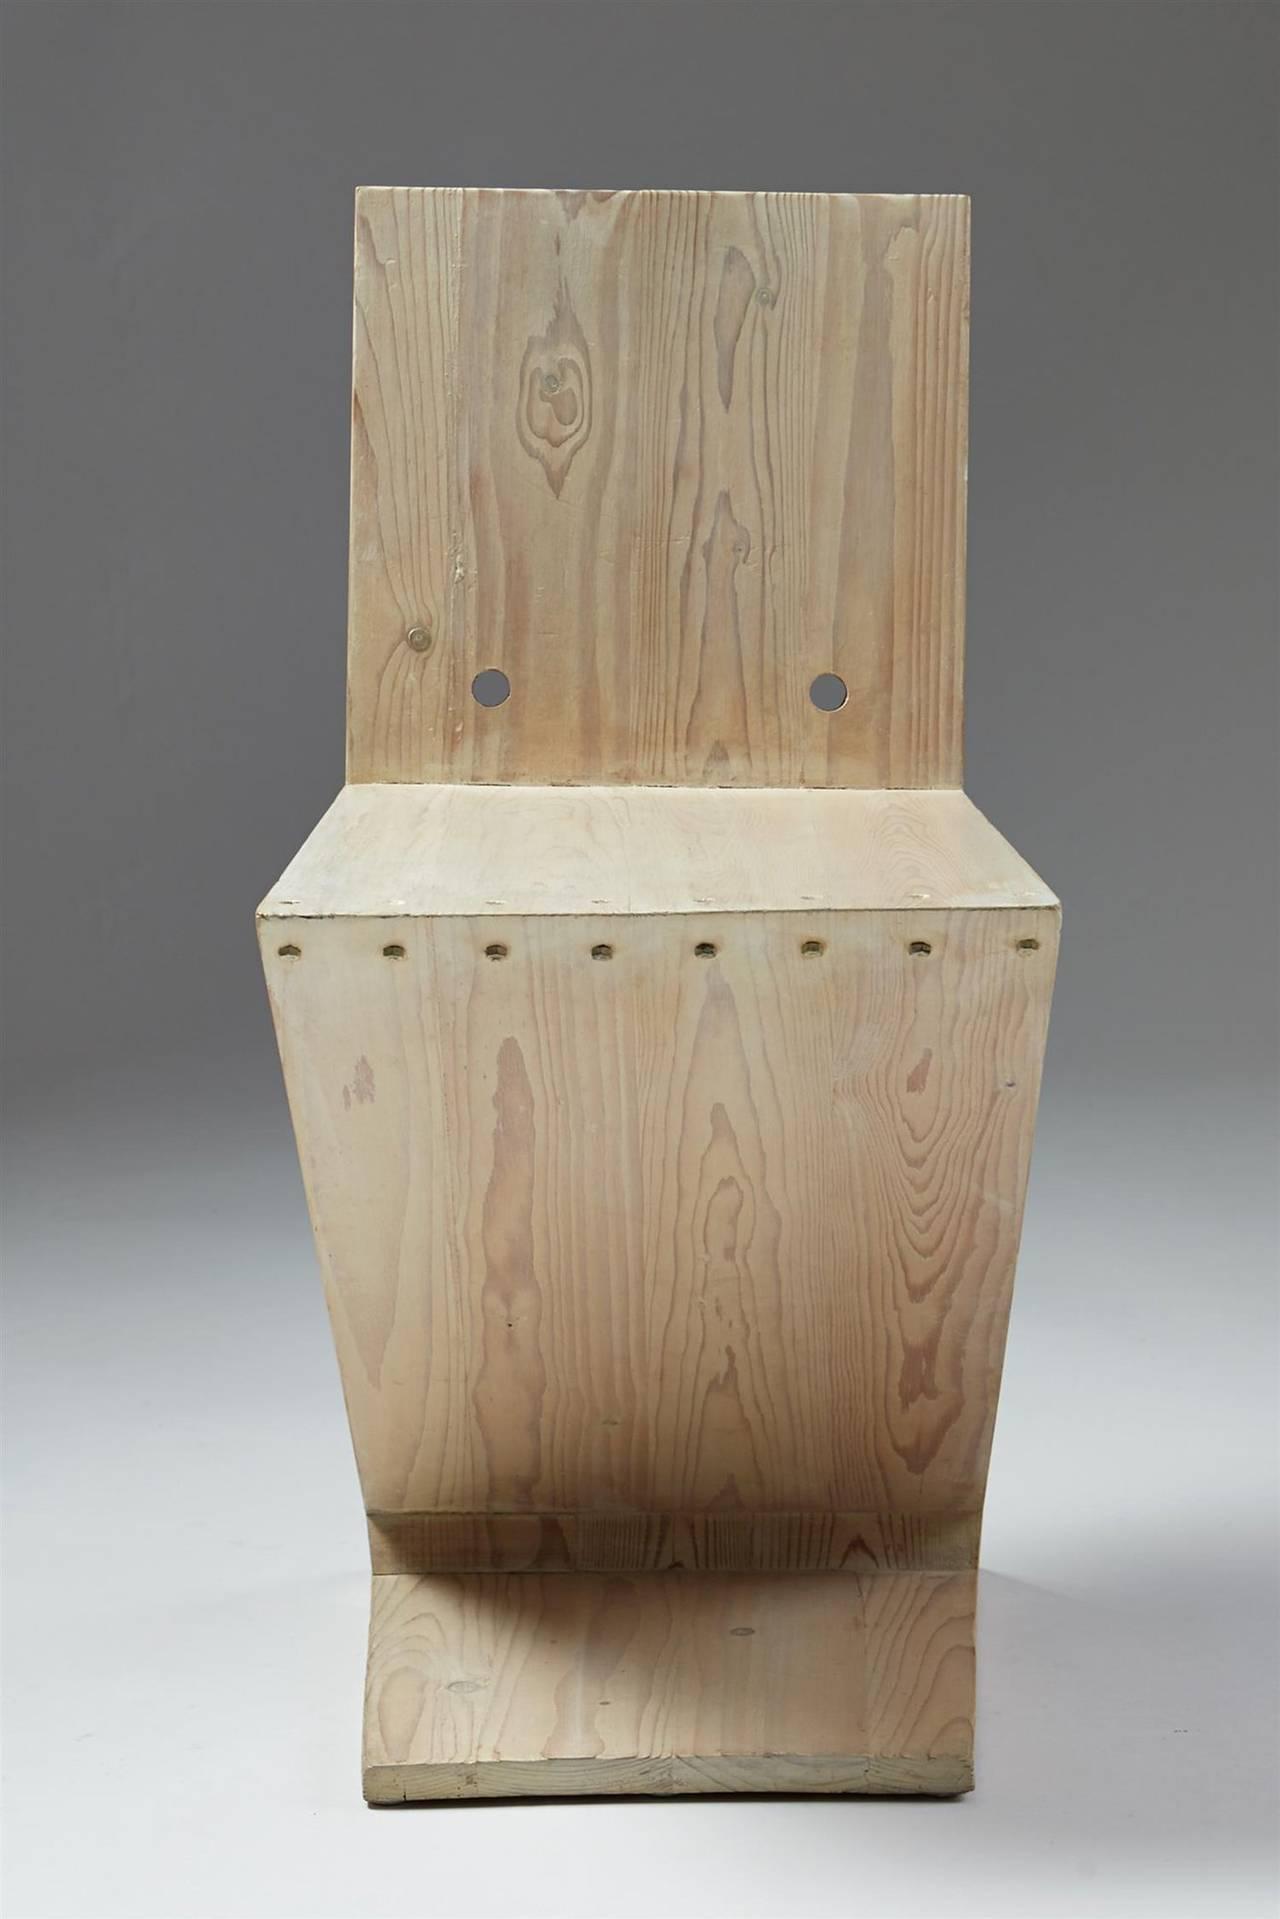 Mid-20th Century Zig Zag Chair Designed by Gerrit Rietveld for G.A. van de Groenekan, Holland